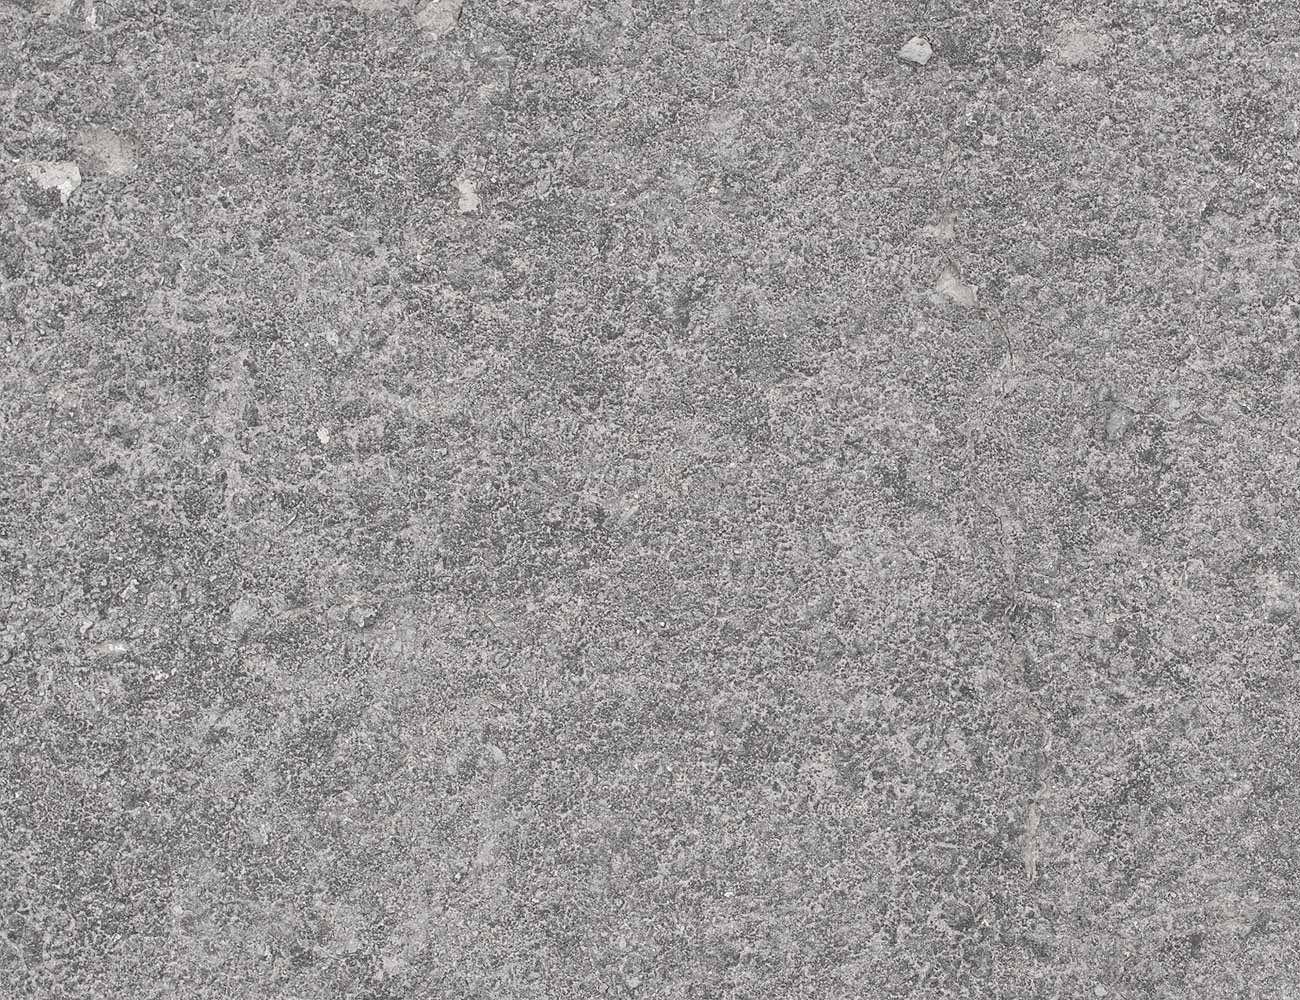 Drylok 174 Concrete Floor Paint Drylok Masonry